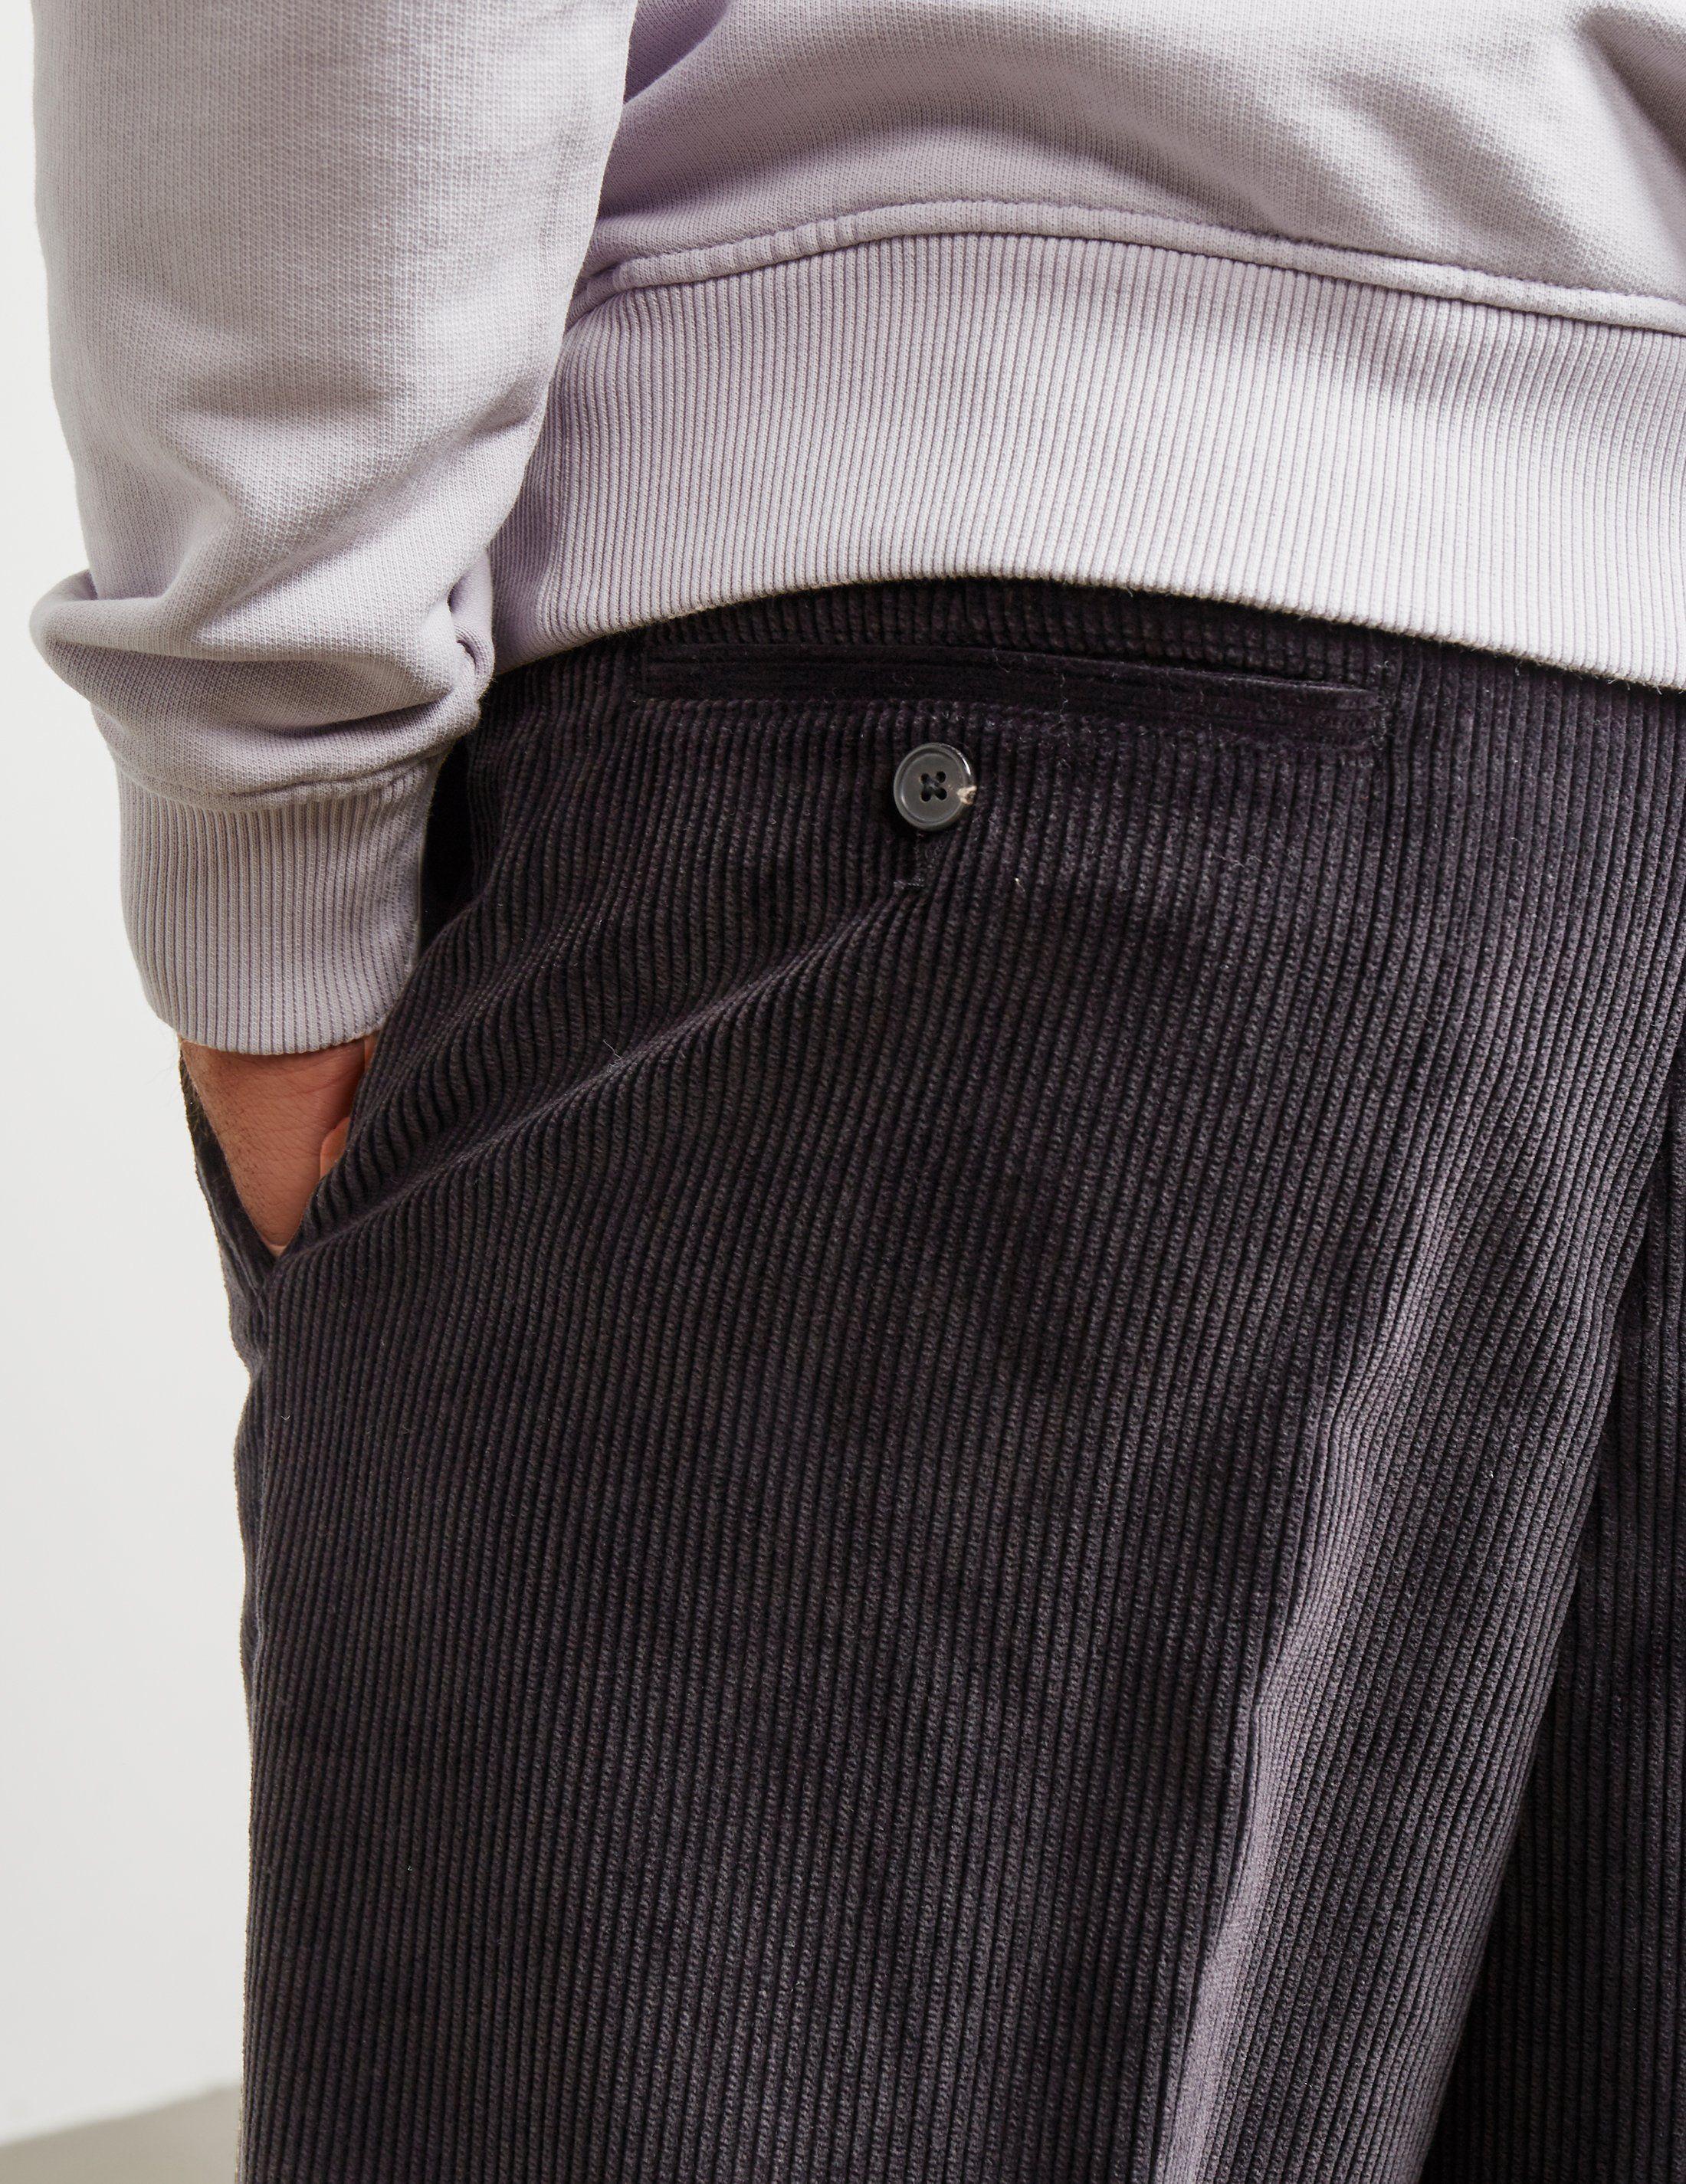 AMI Paris Cord Carrot Trousers - Online Exclusive